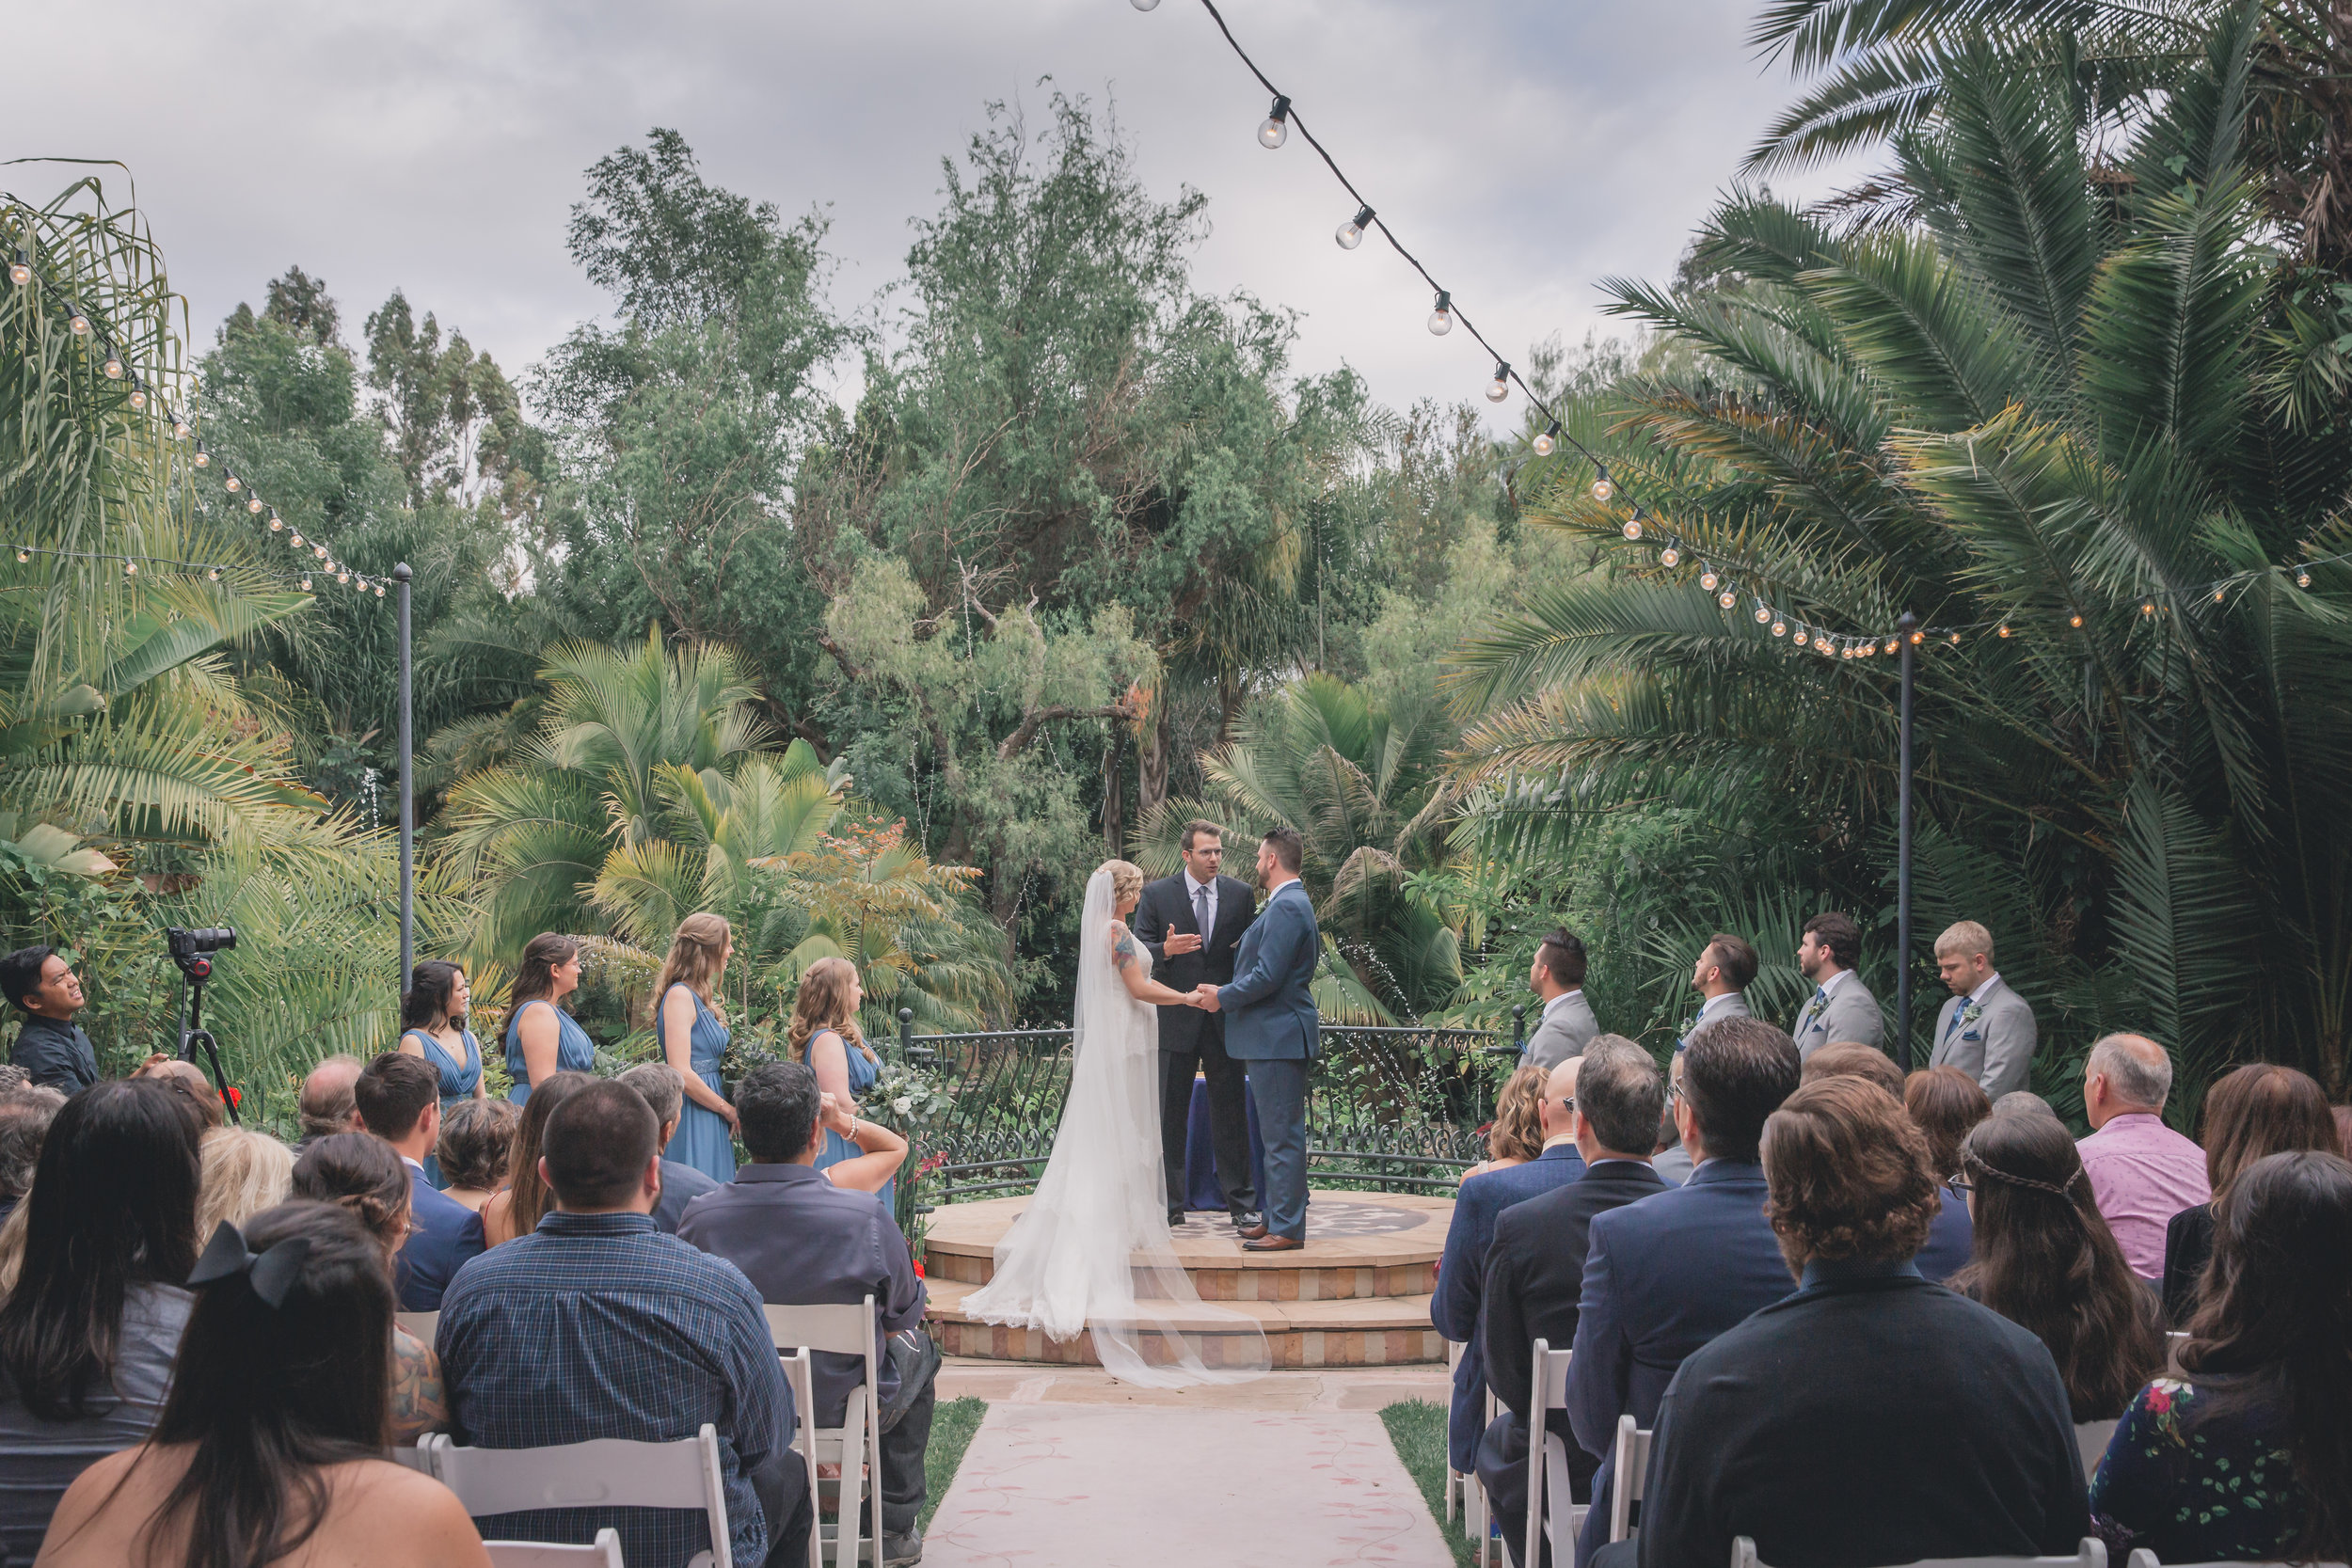 Wedding Photography - Edens Gardens, Moorpark California Wedding Venue - Wedding Ceremony